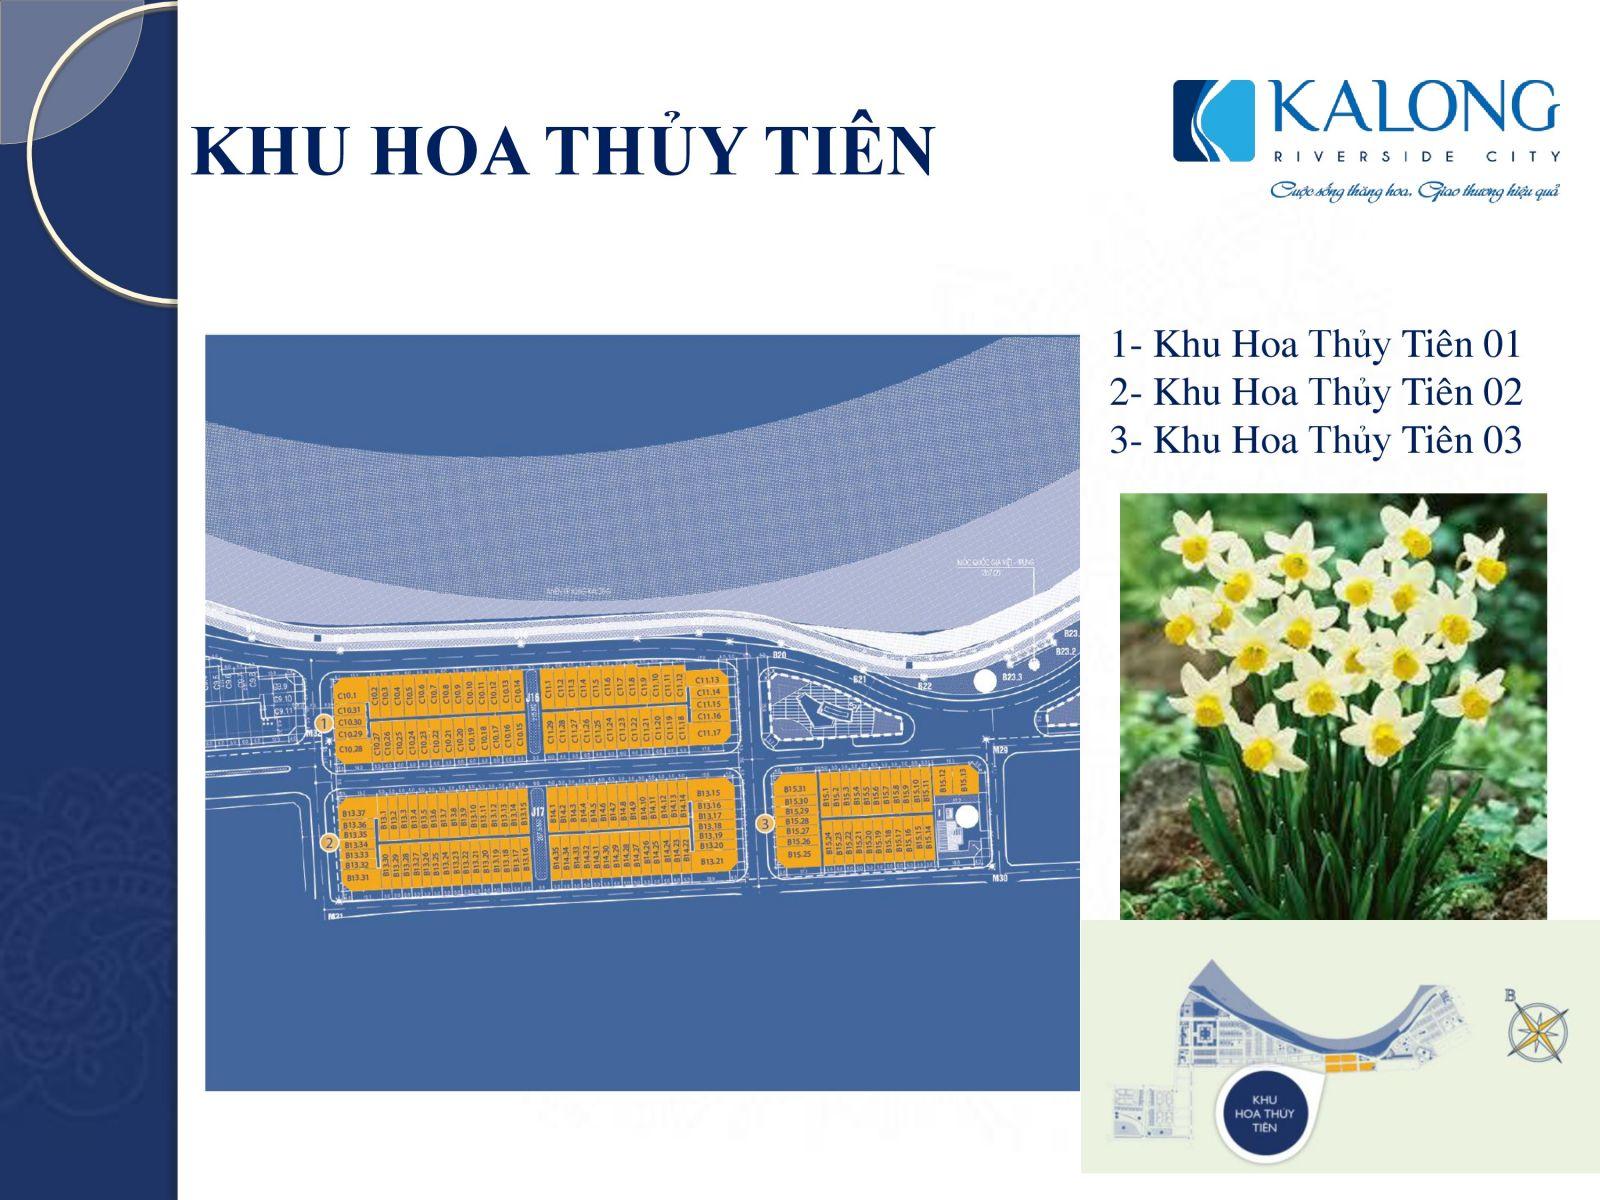 kalong riverside hoa thủy tiên